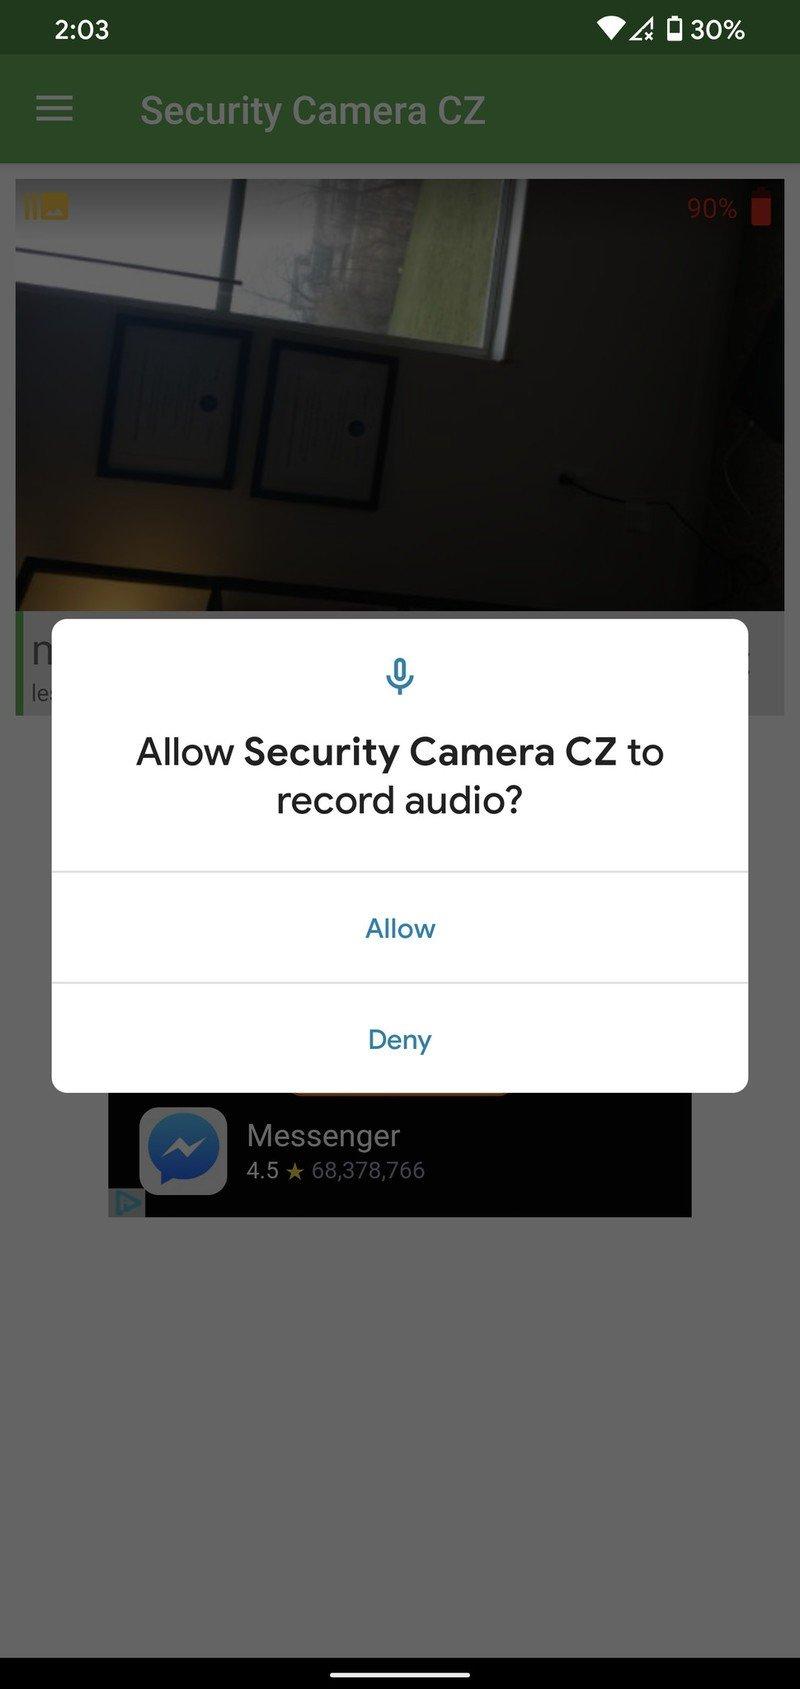 security-camera-cz-viewer-5.jpg?itok=Pgn